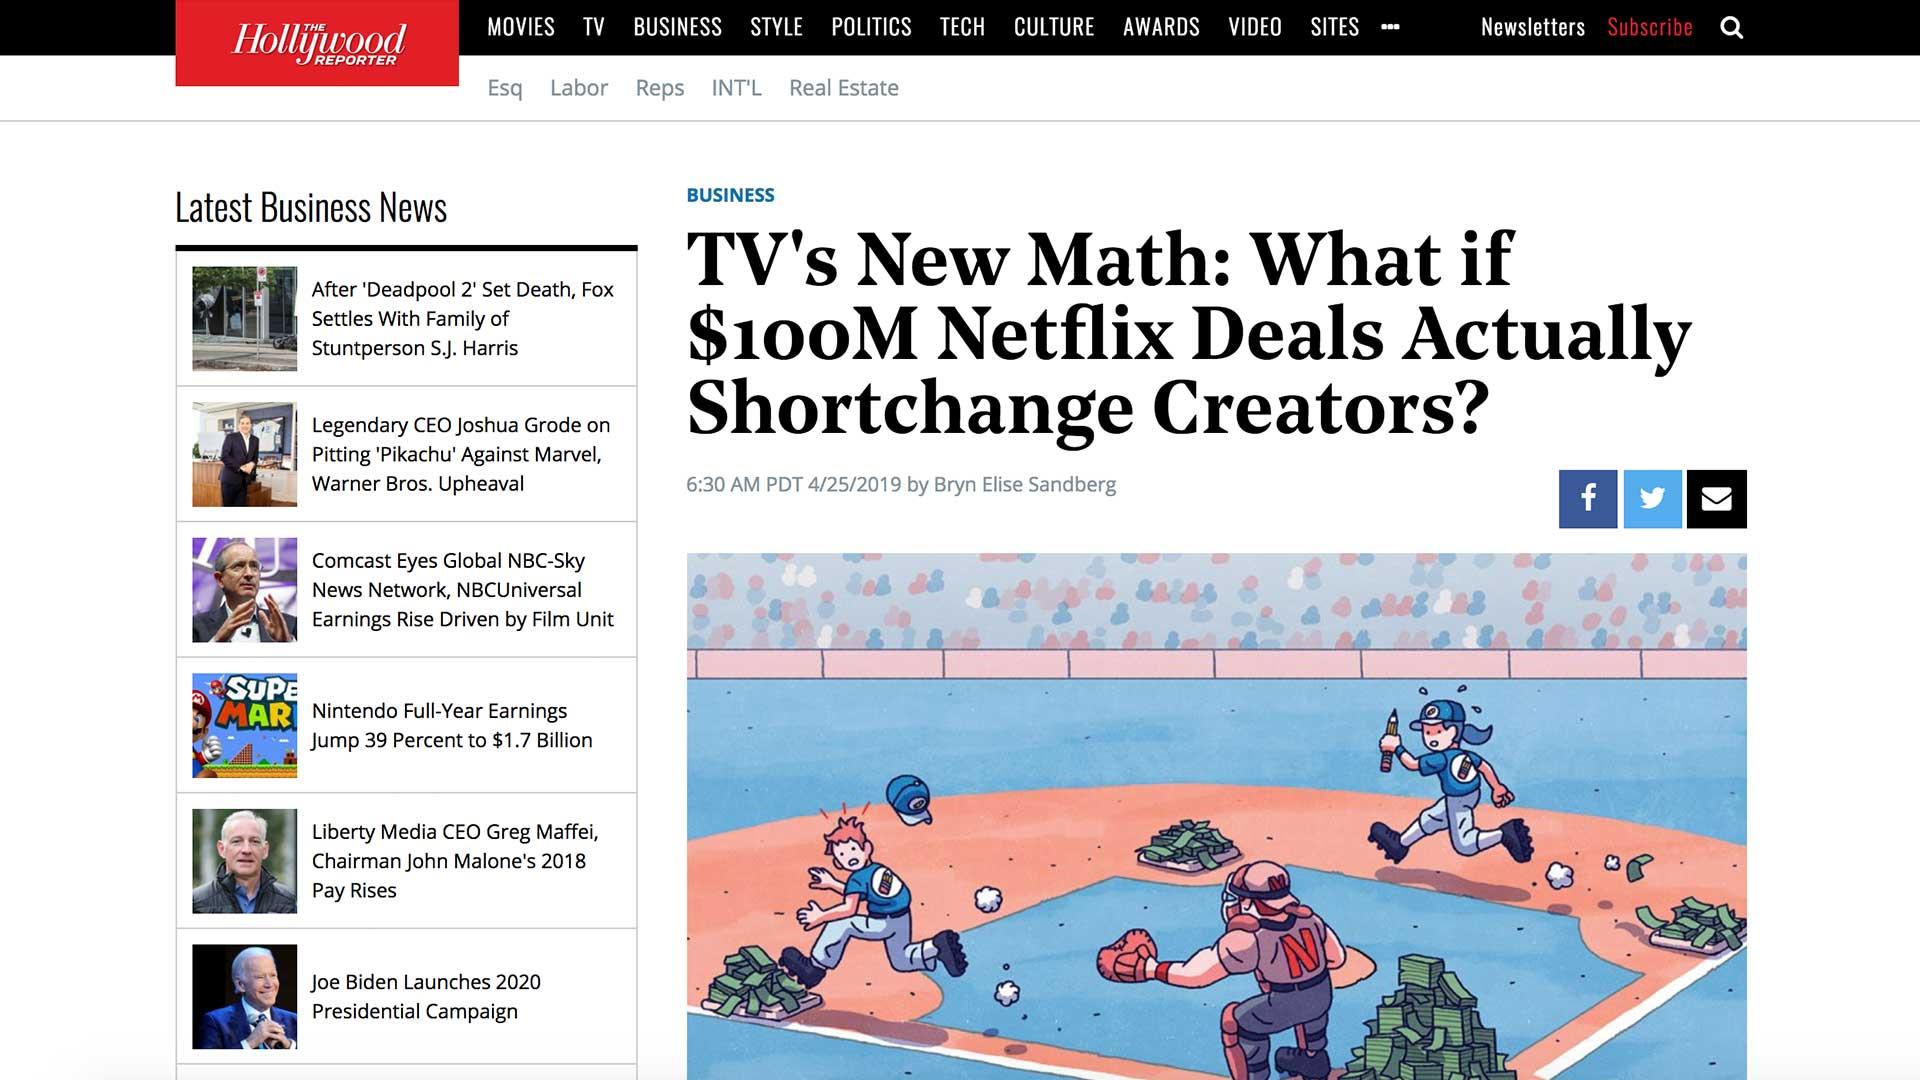 Fairness Rocks News TV's New Math: What if $100M Netflix Deals Actually Shortchange Creators?